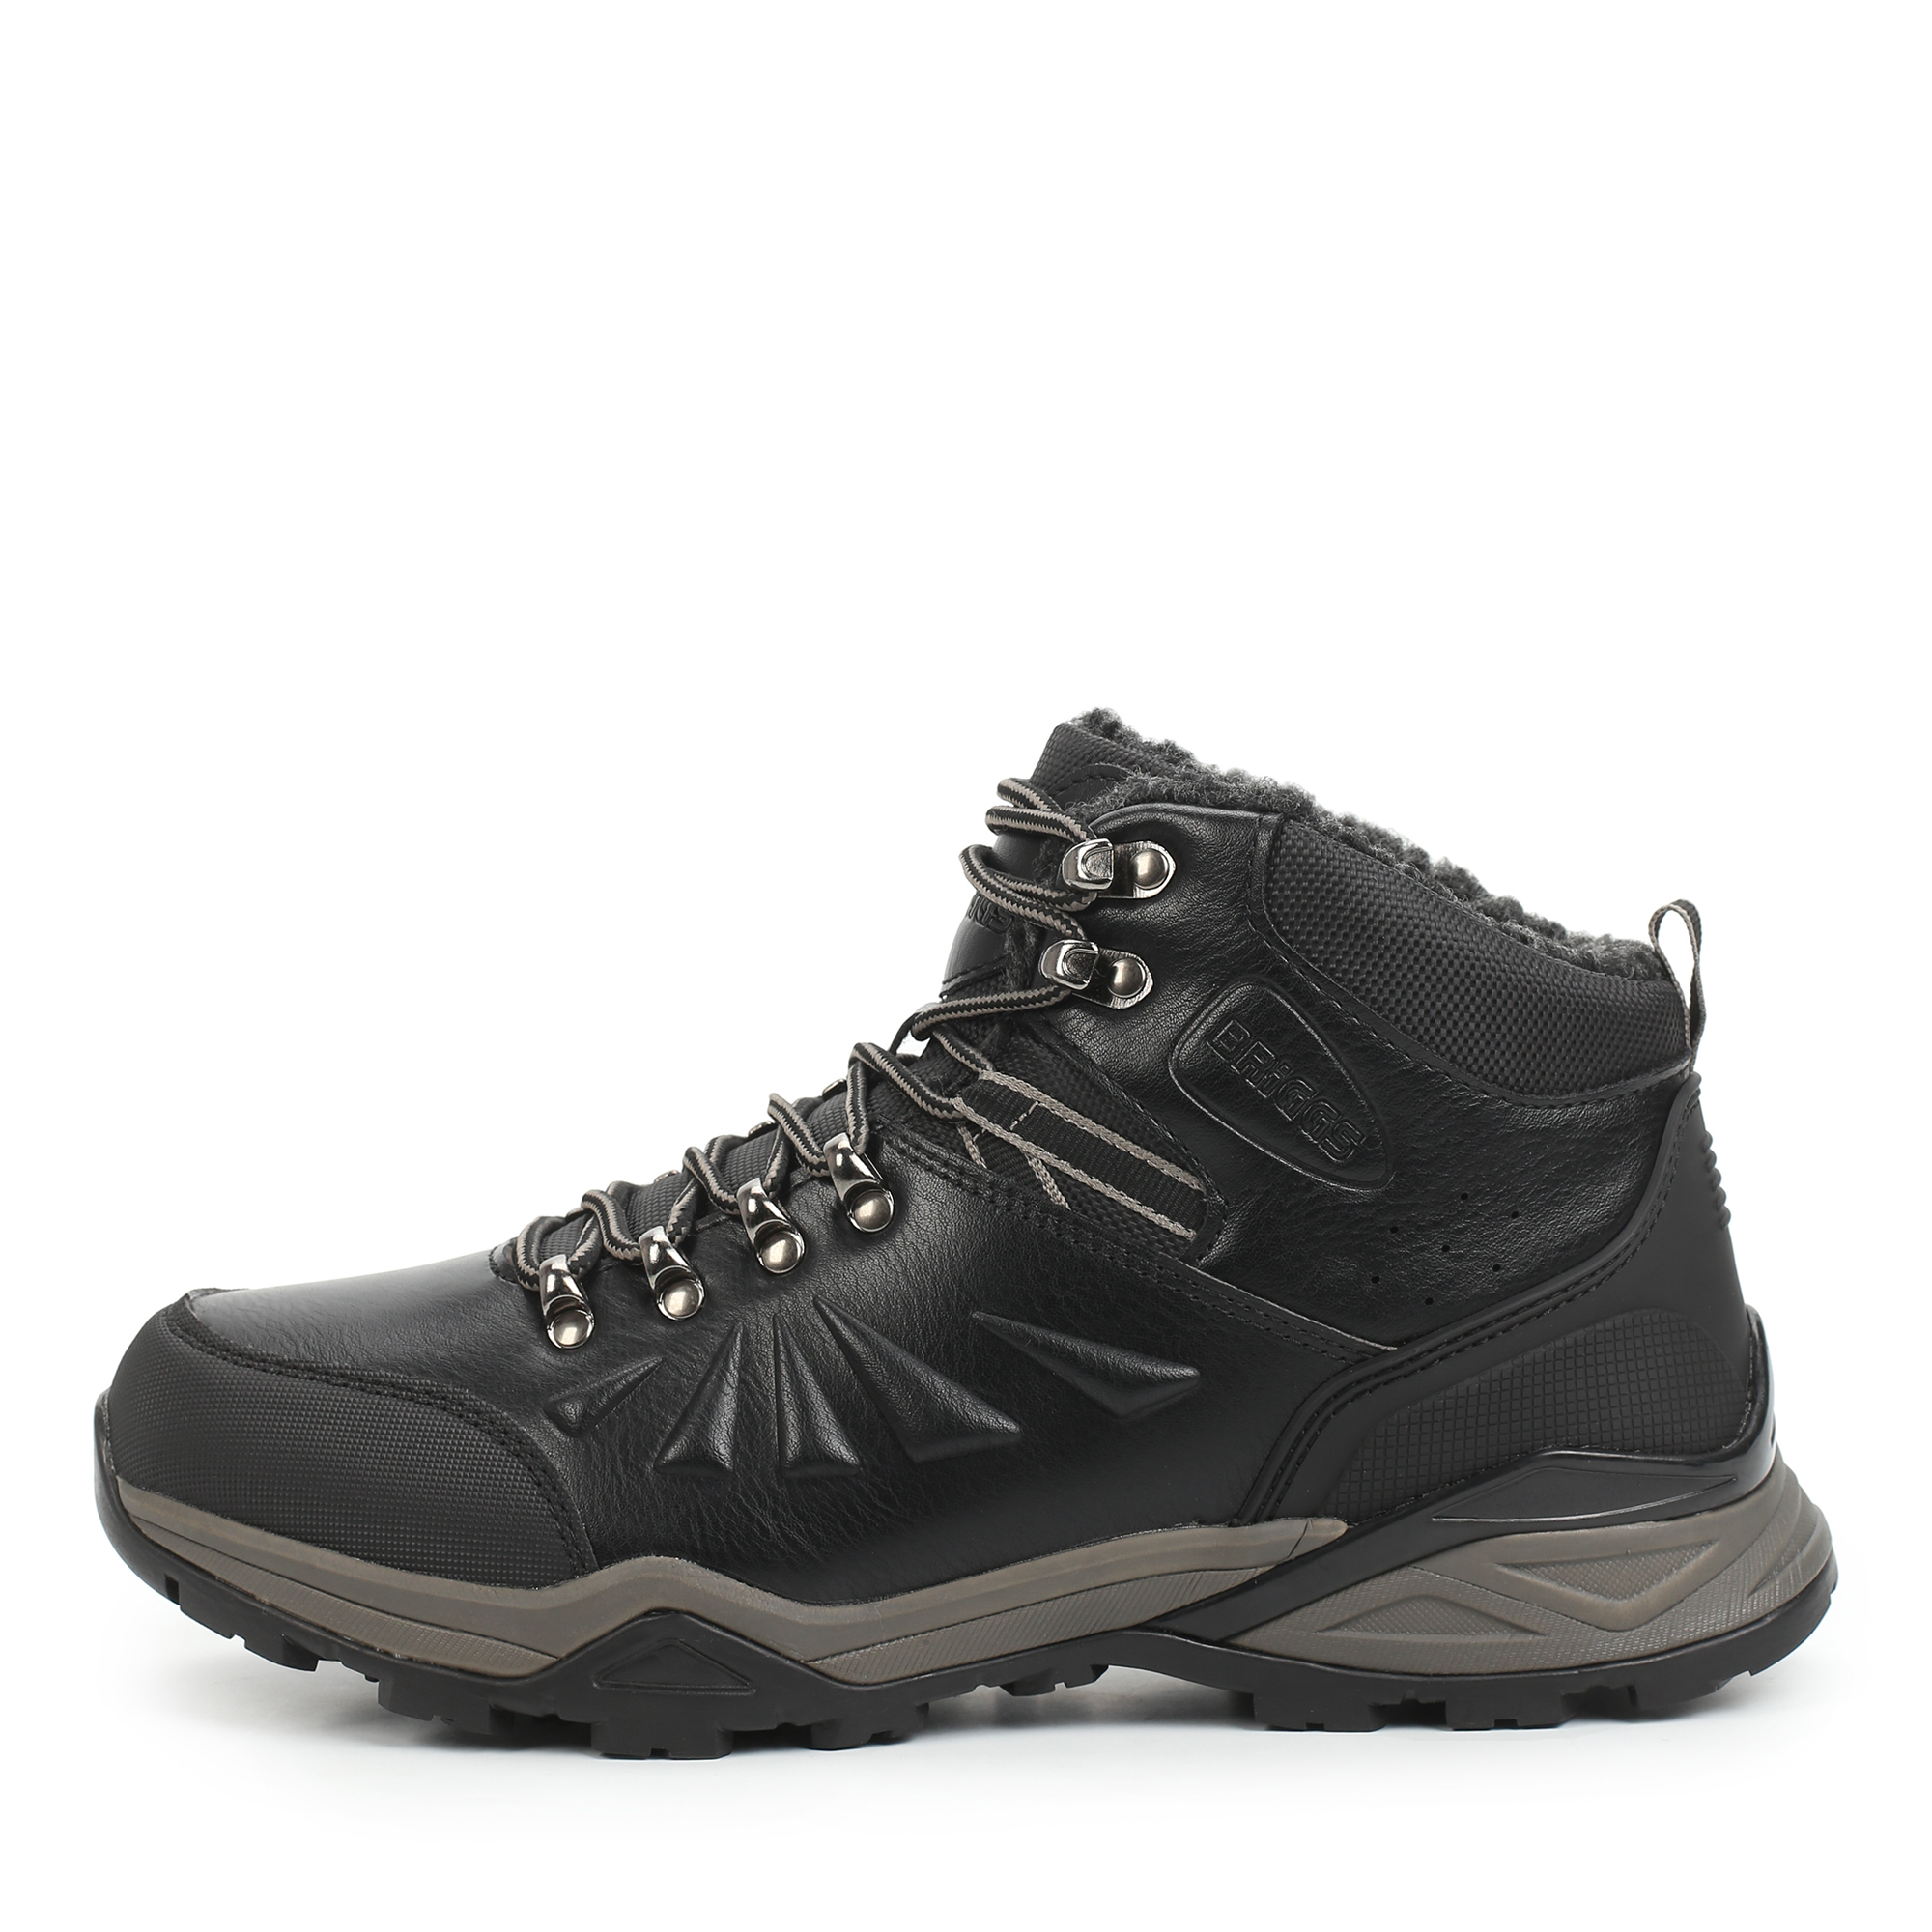 Ботинки BRIGGS 064-080A-4602